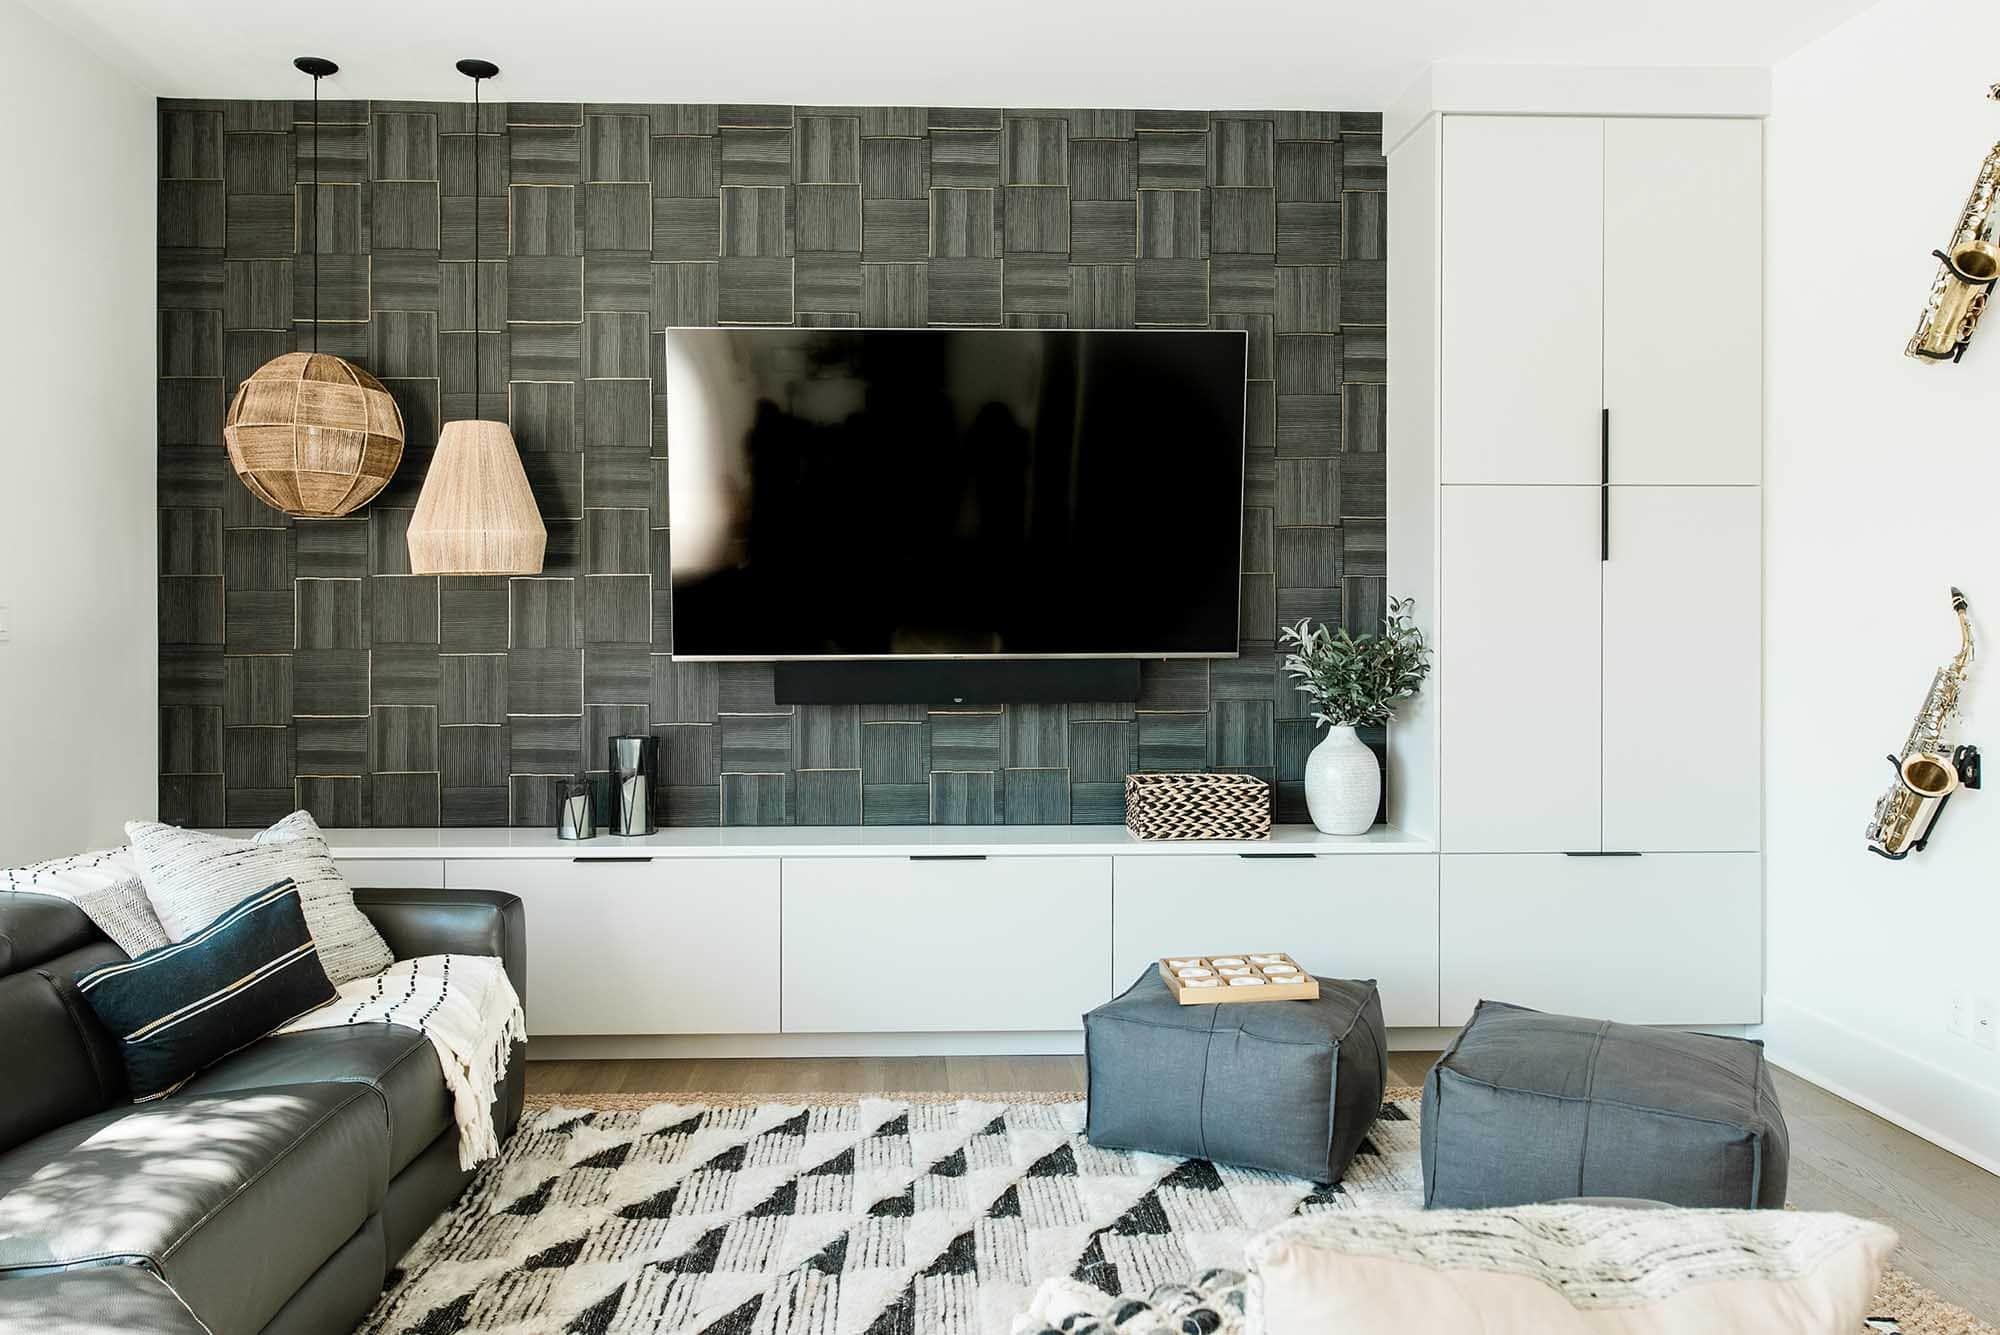 Wallpaper feature wall, dark grey graphic pattern, TV room, Alamo Heights wallpaper hanger